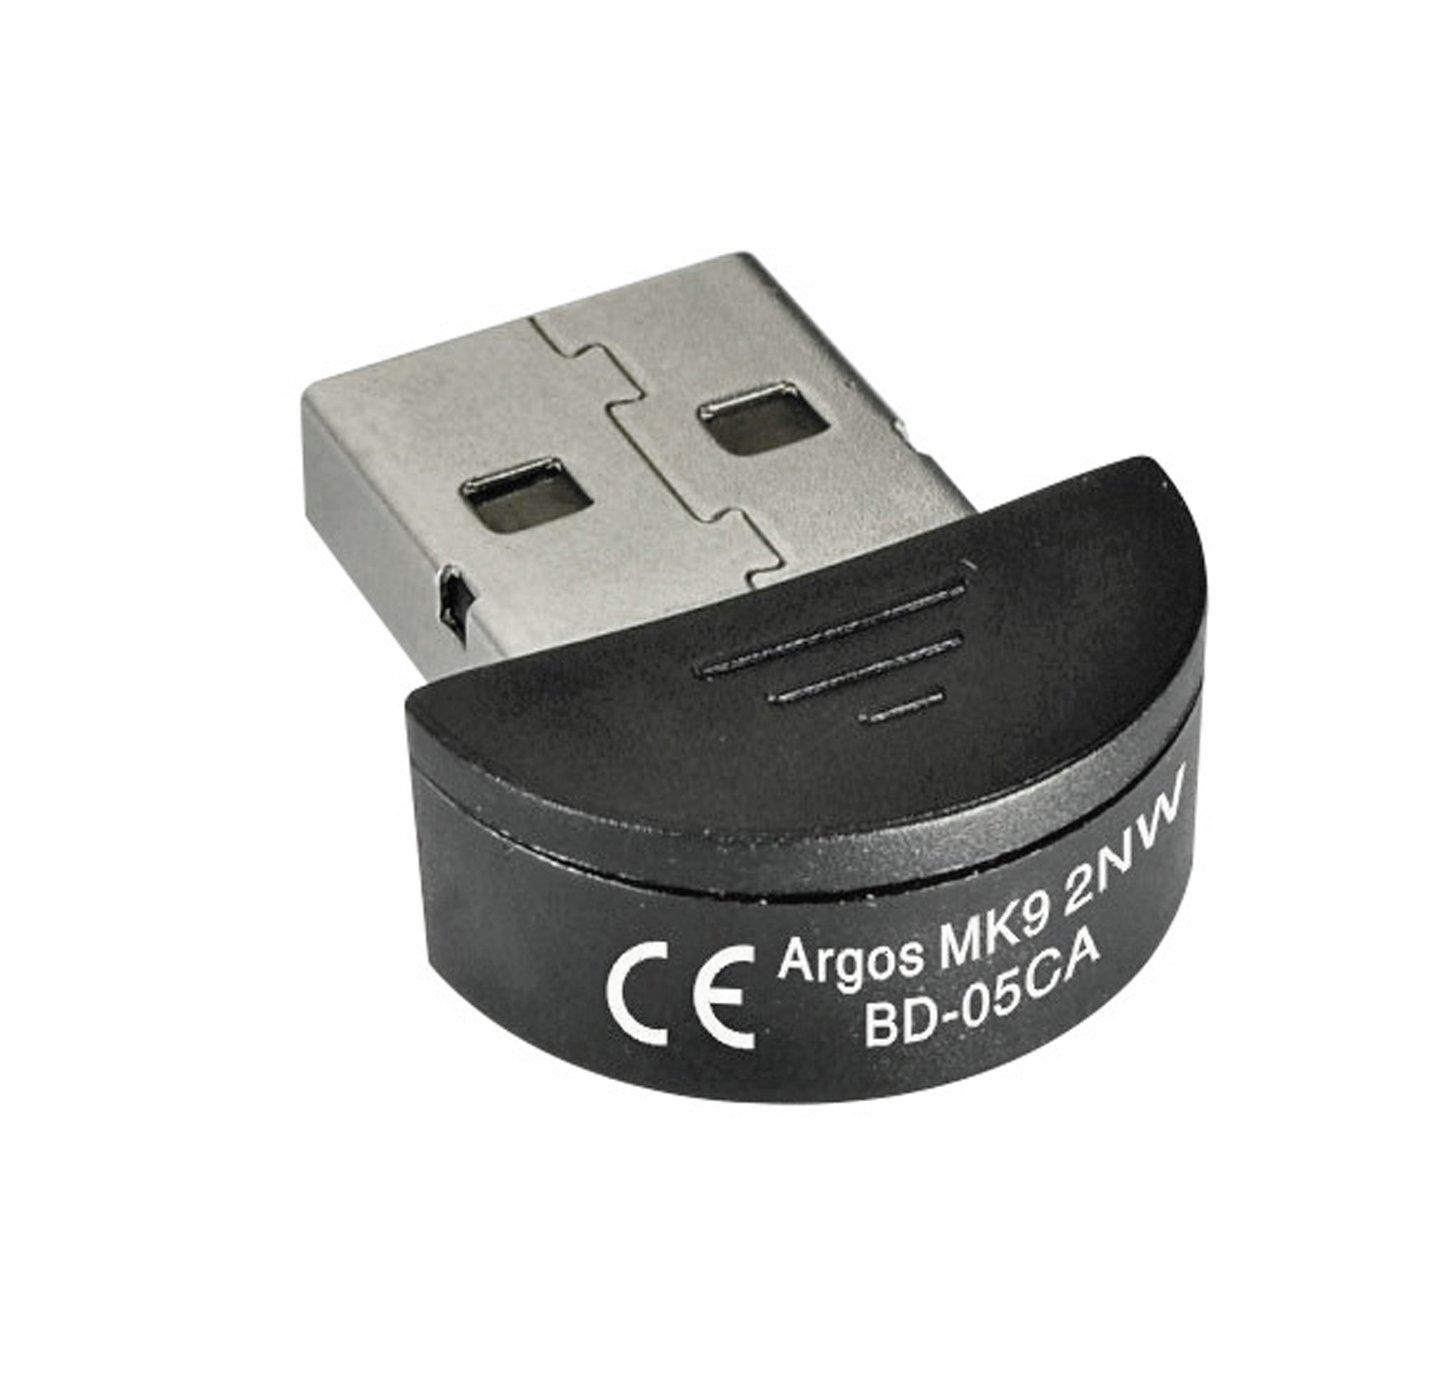 Micro 10m USB Bluetooth Adaptor